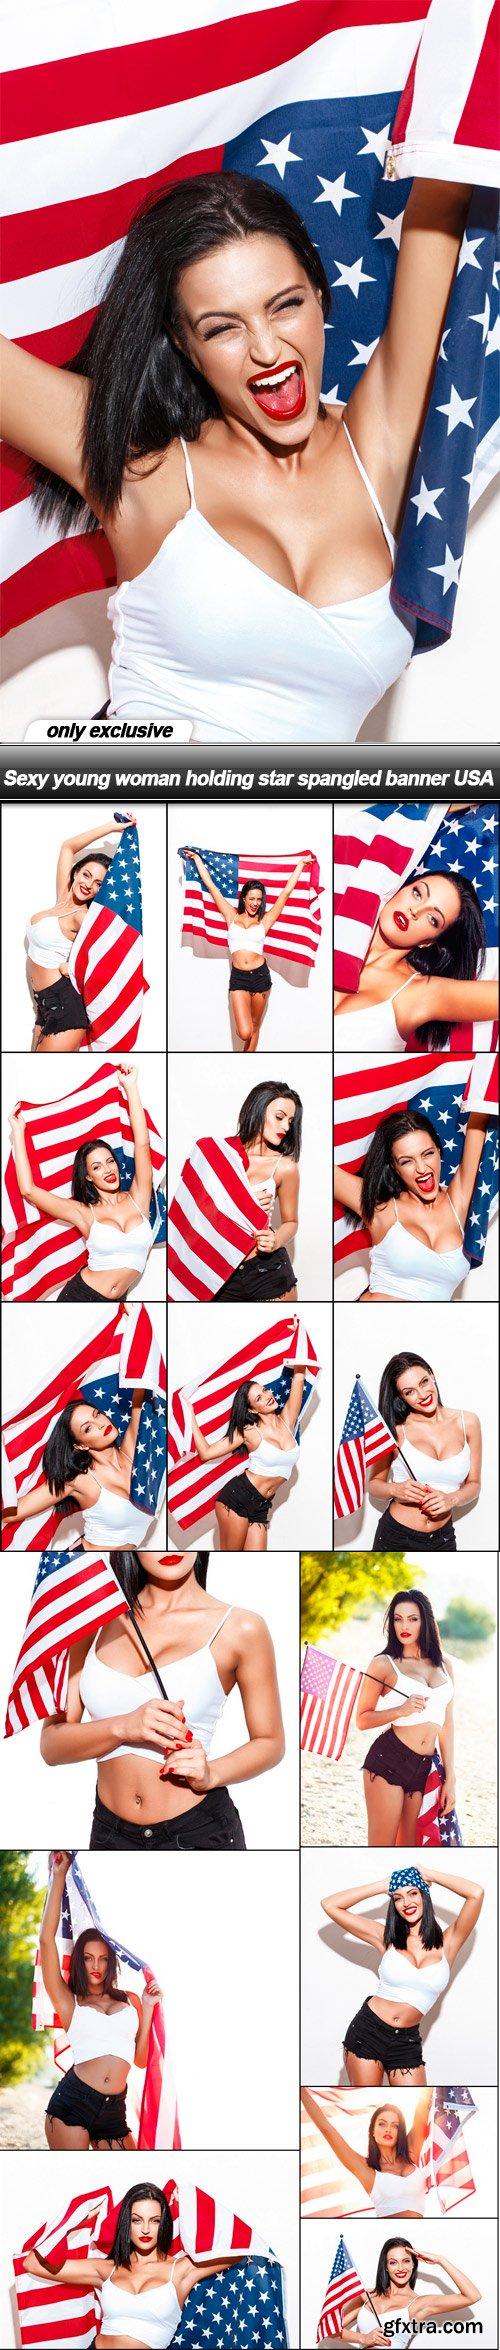 Sexy young woman holding star spangled banner USA - 16 UHQ JPEG